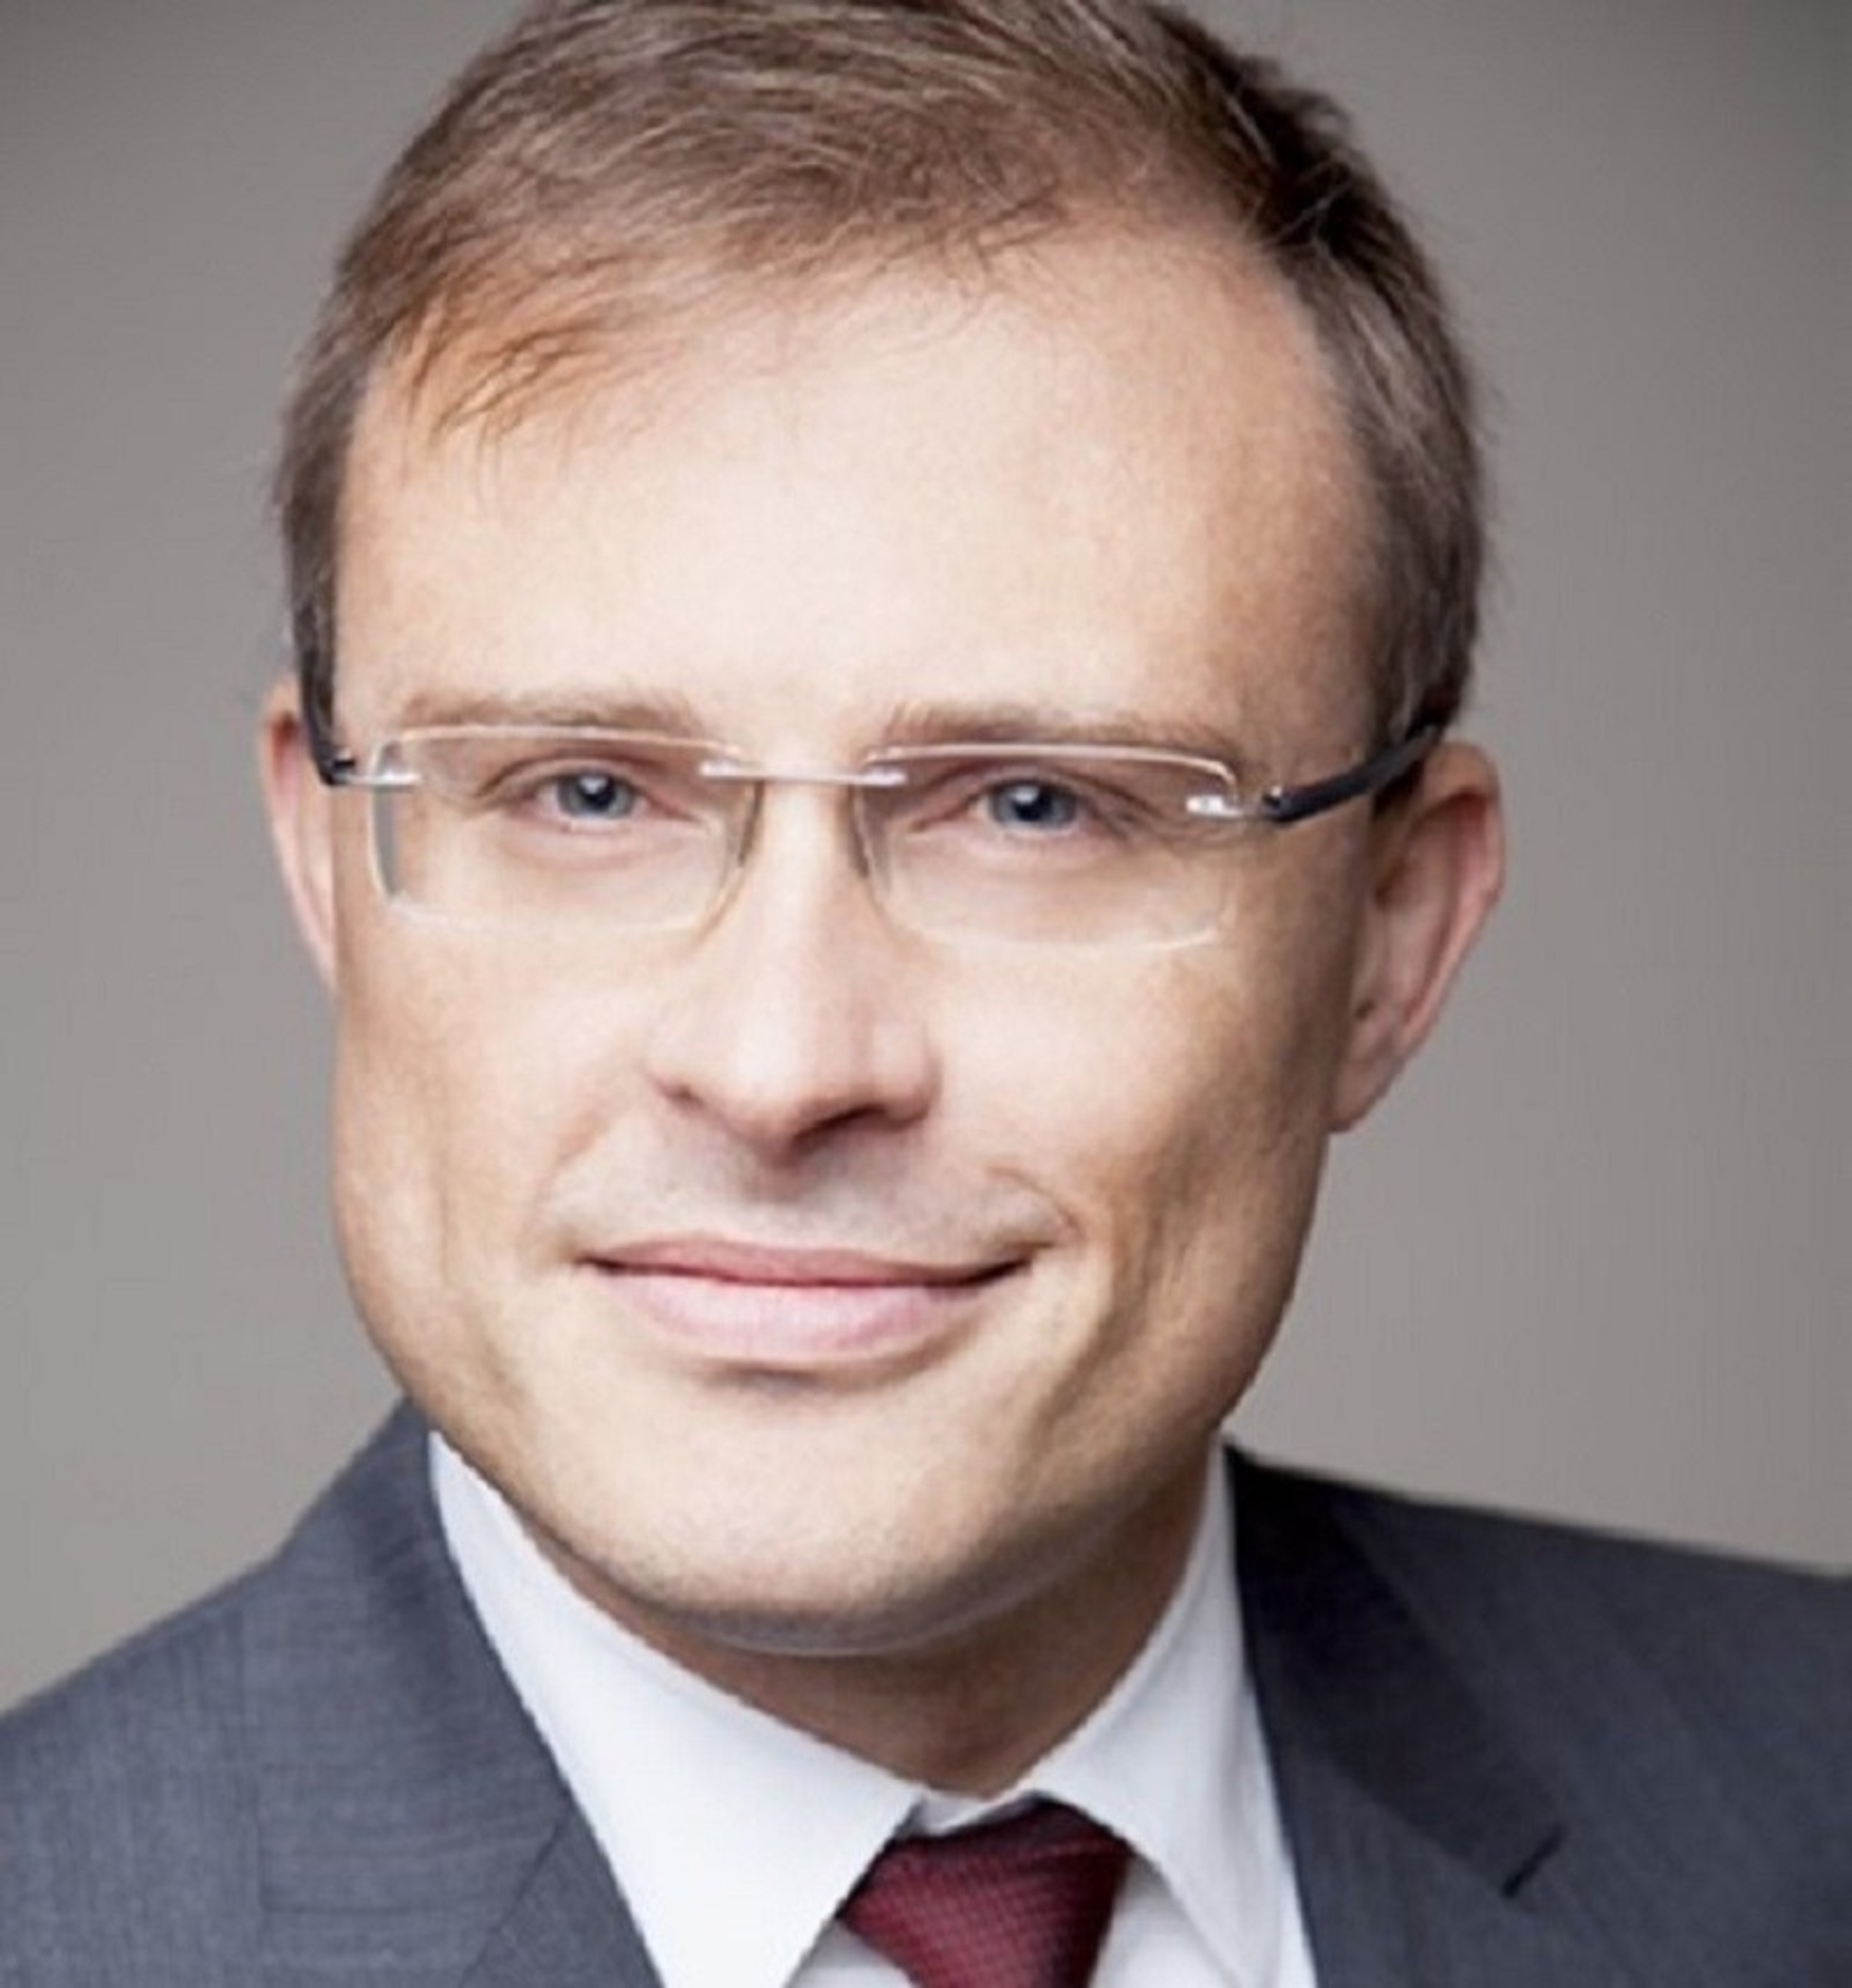 Olivier Lehmann, Principal